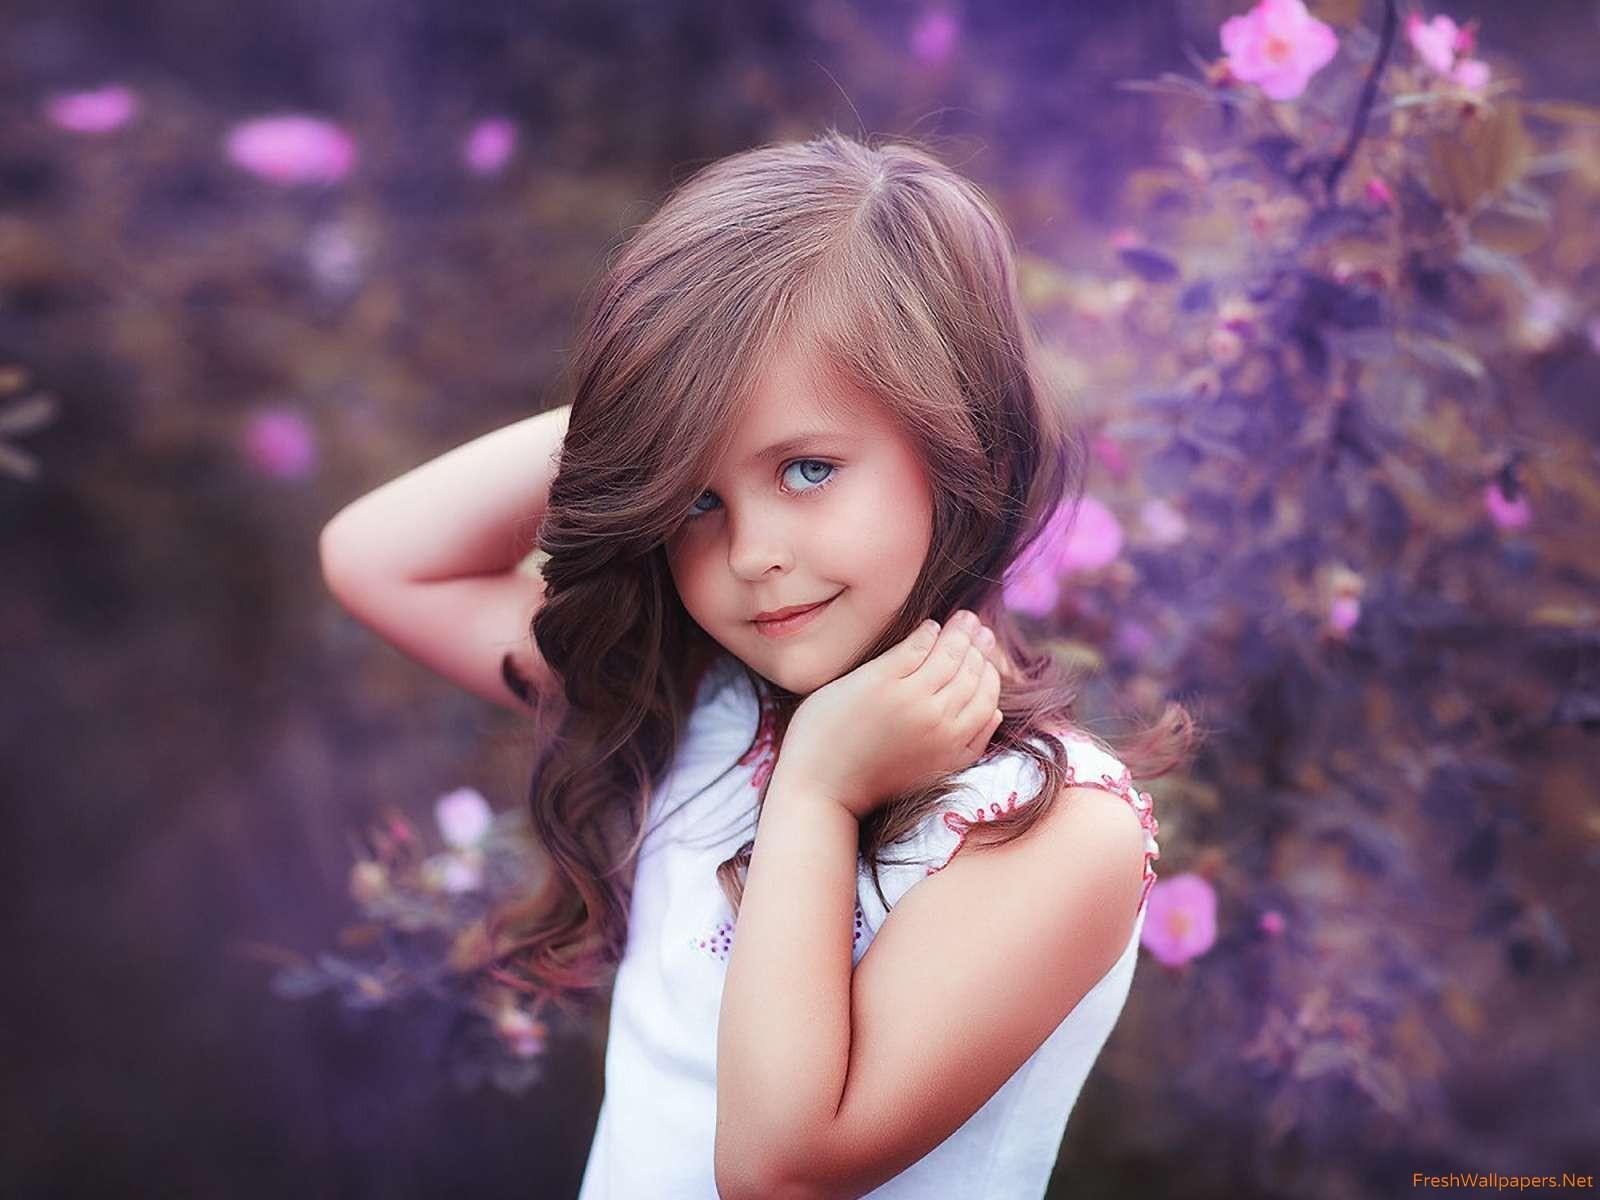 Sweet Girls Wallpaper 1089154 Beautiful Child 1664194 Hd